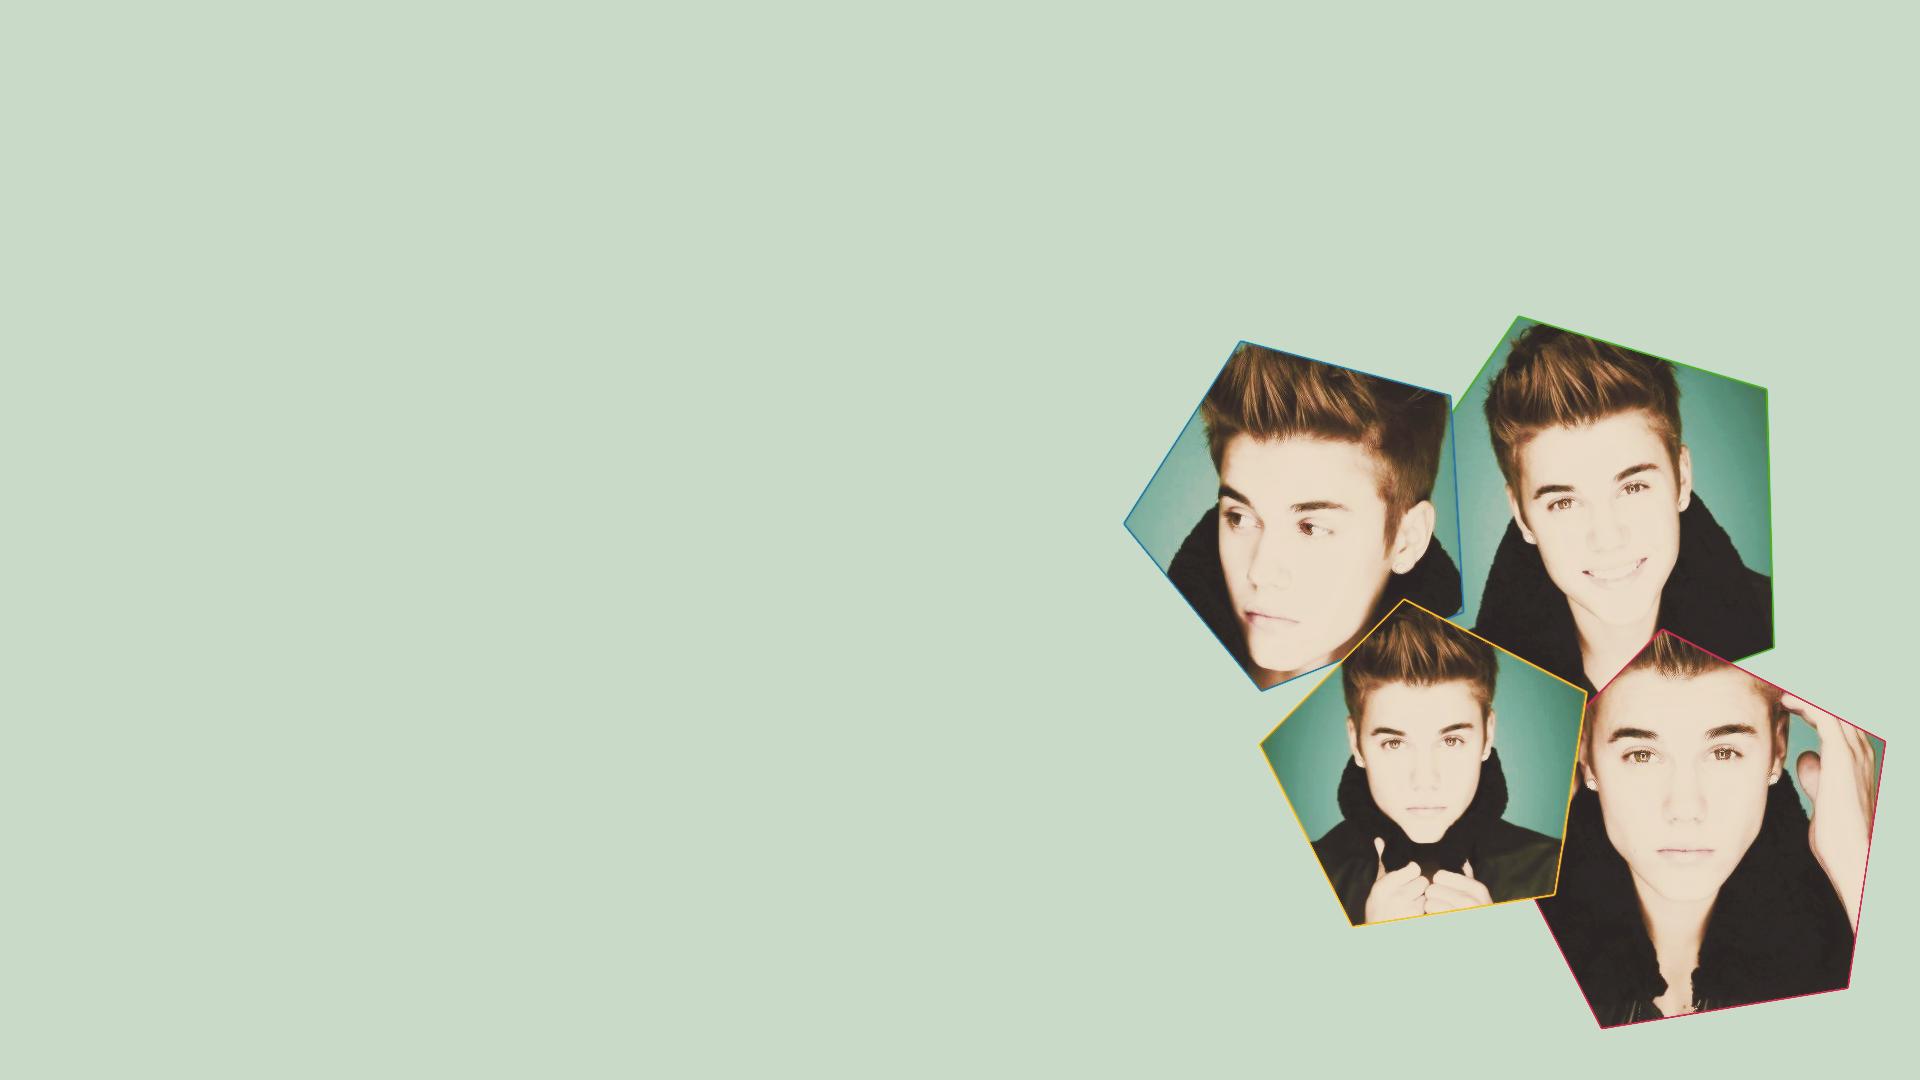 Justin Bieber Tumblr Backgrounds 2014 Justin bieber ipad wal...